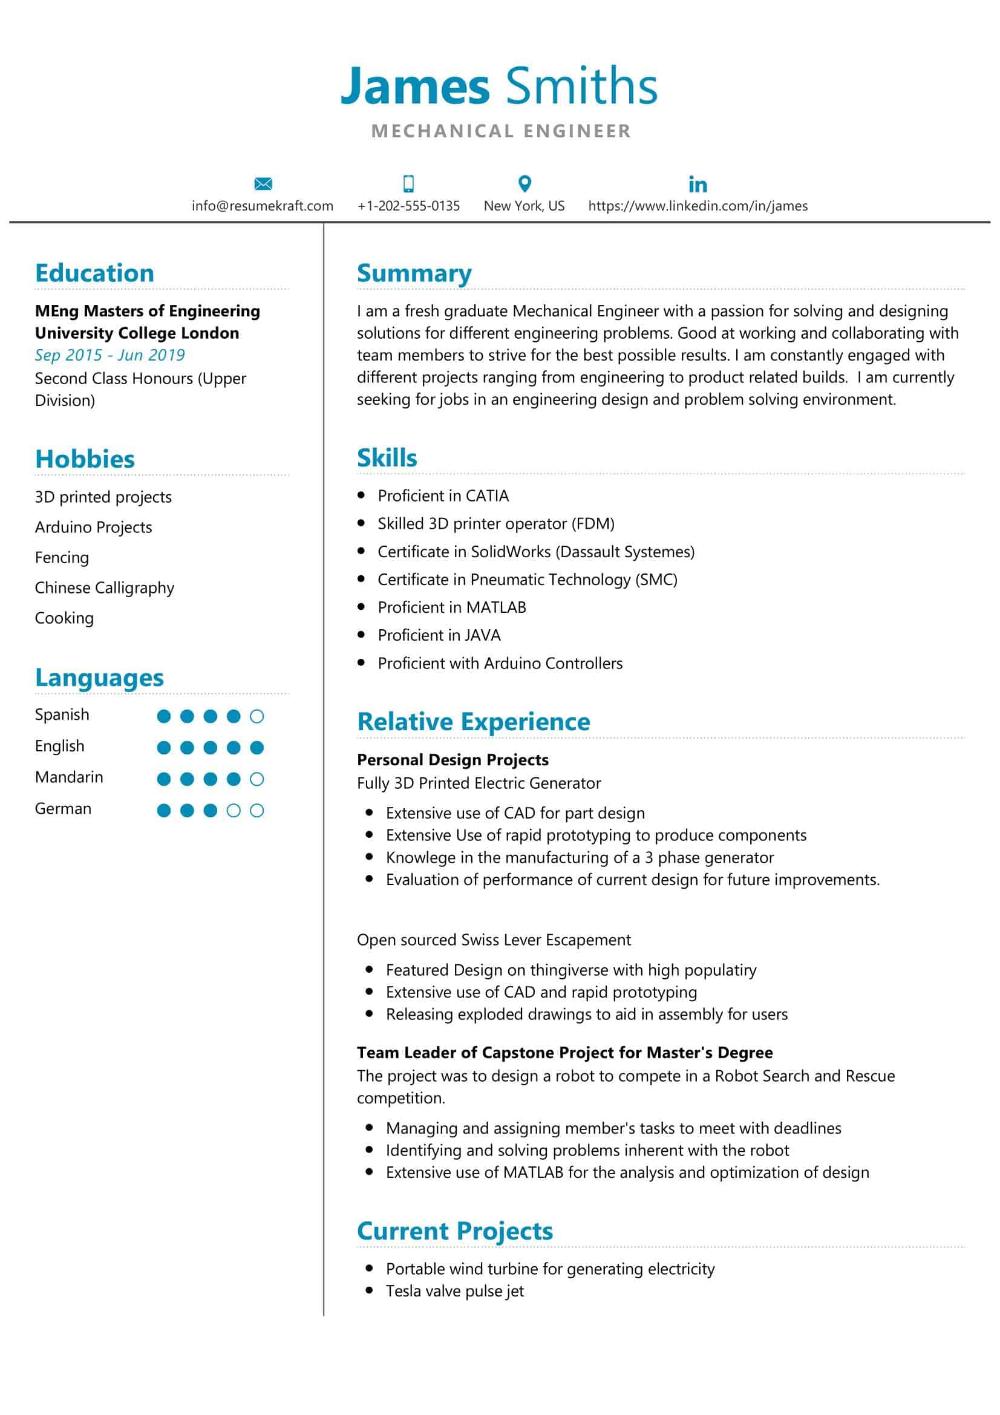 100 Professional Resume Samples For 2020 Resumekraft Student Resume Engineering Student Engineering Resume